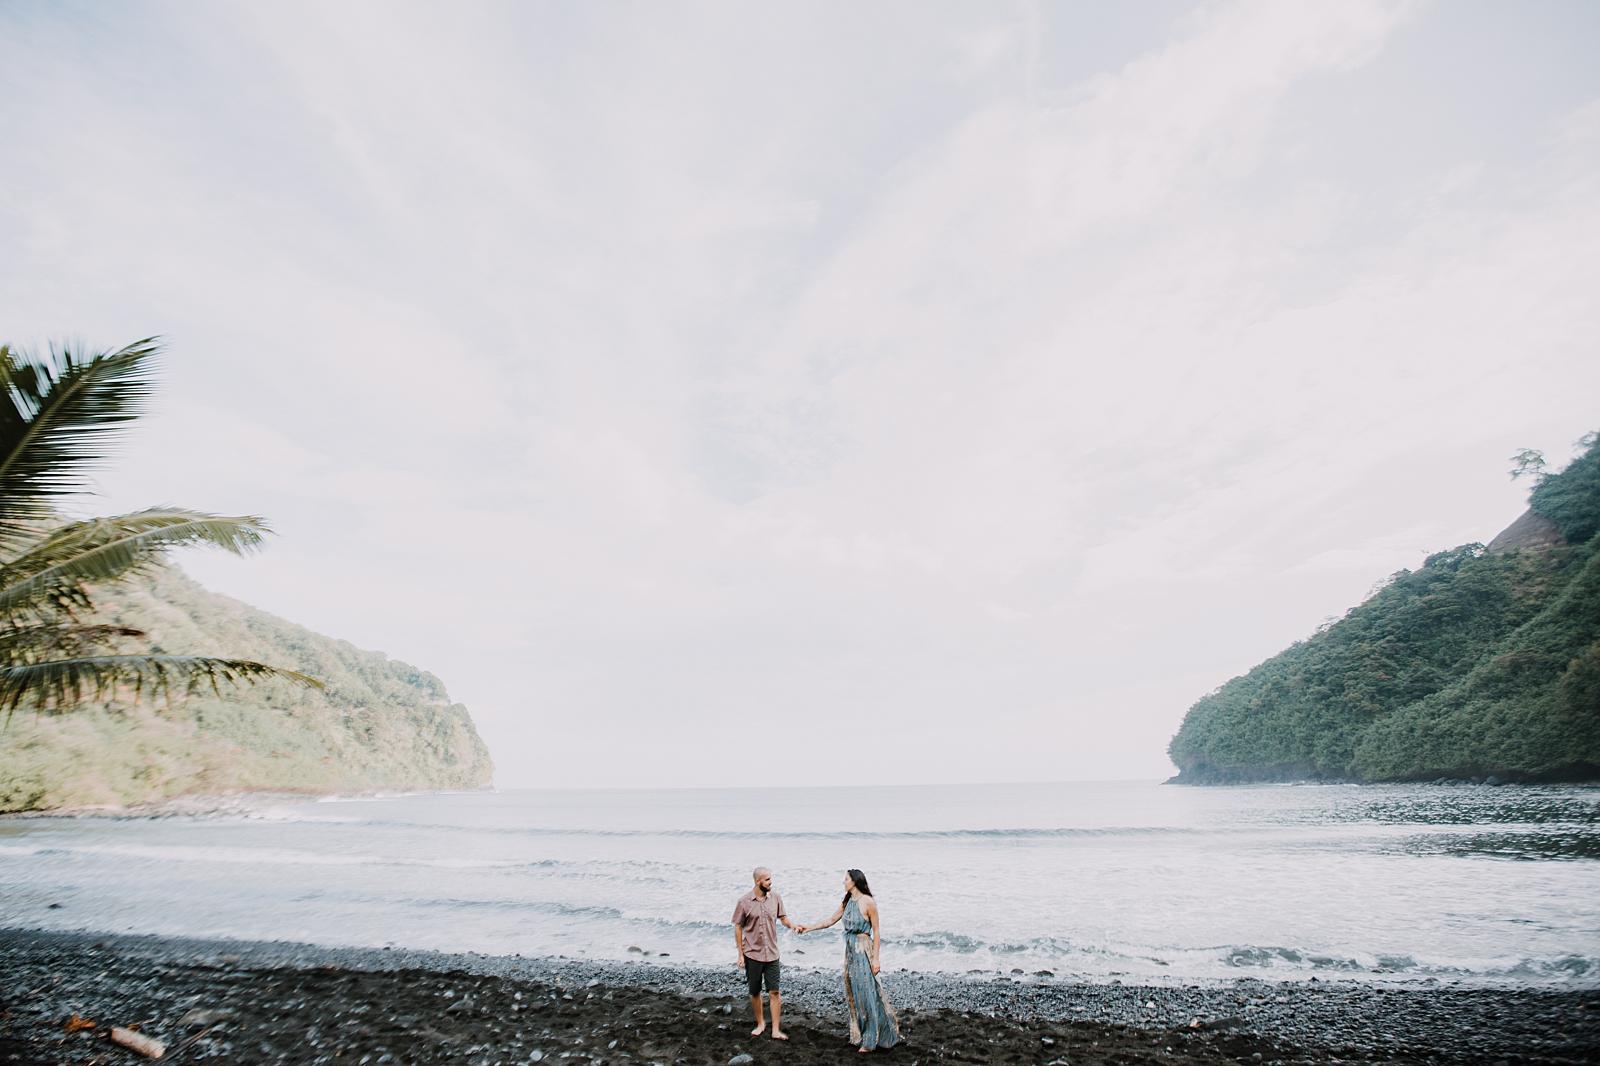 hiking the road to hana maui hawaii, maui swimsuit engagements, hawaii waterfalls hike, hawaiian coastline, hiking the maui coast, driving the road to hana